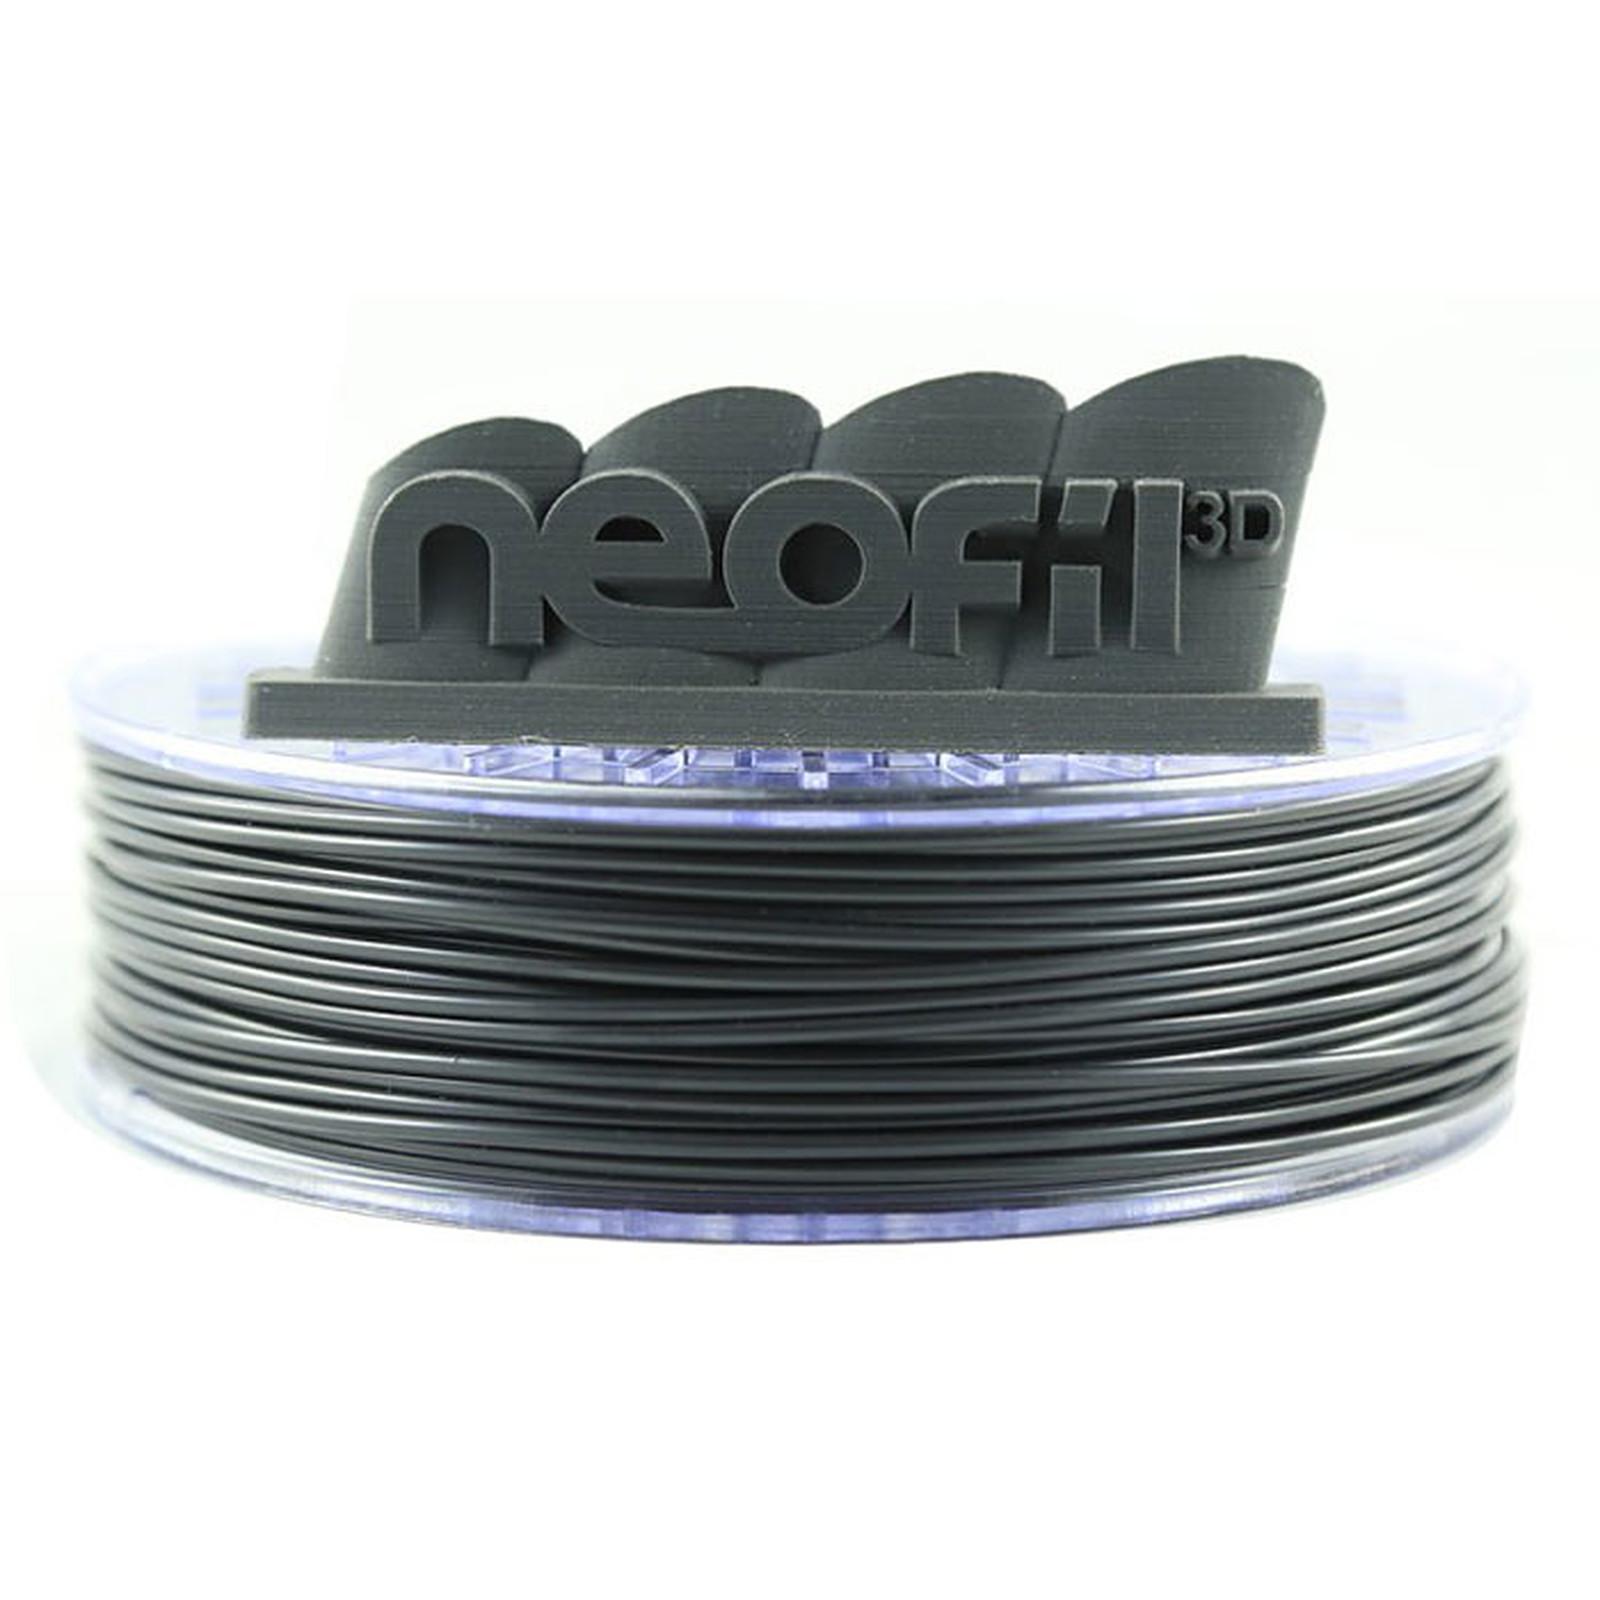 Neofil3D Bobine ABS 1.75mm 750g - Gris